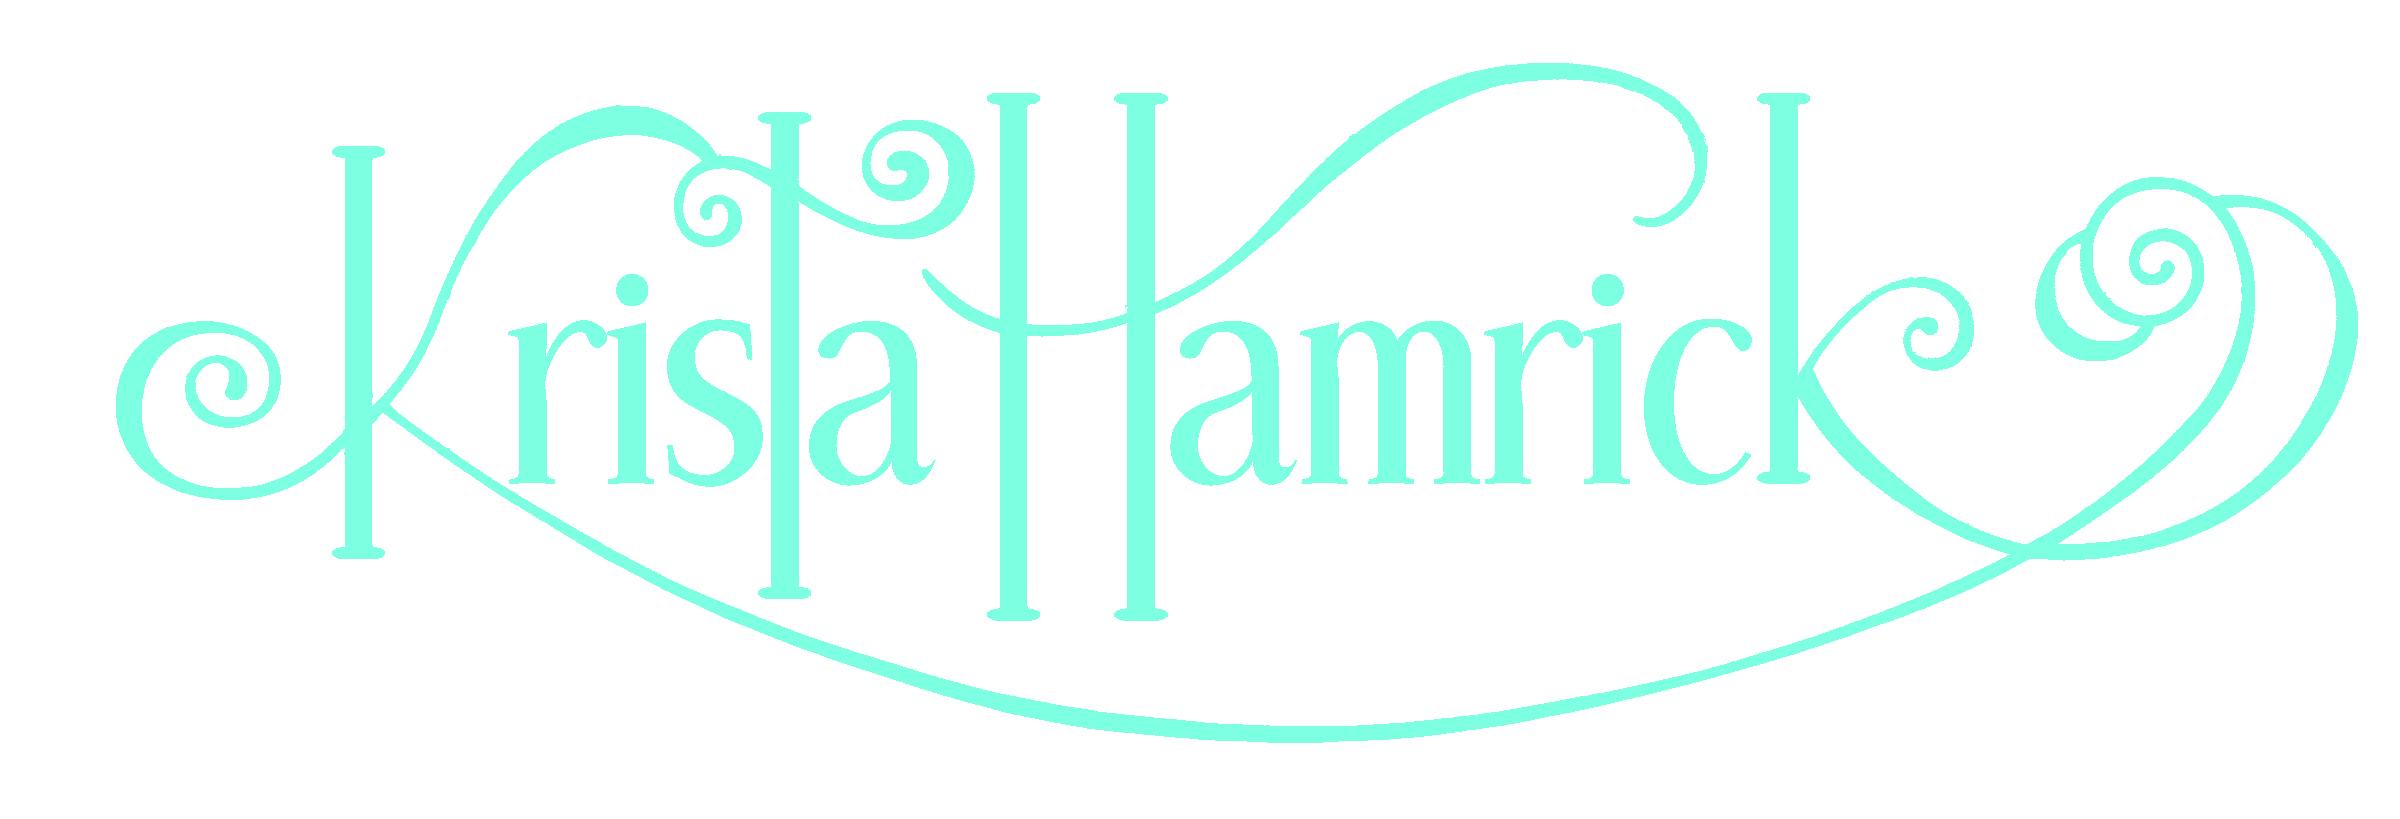 krista-hamrick-logo-snss1.jpg